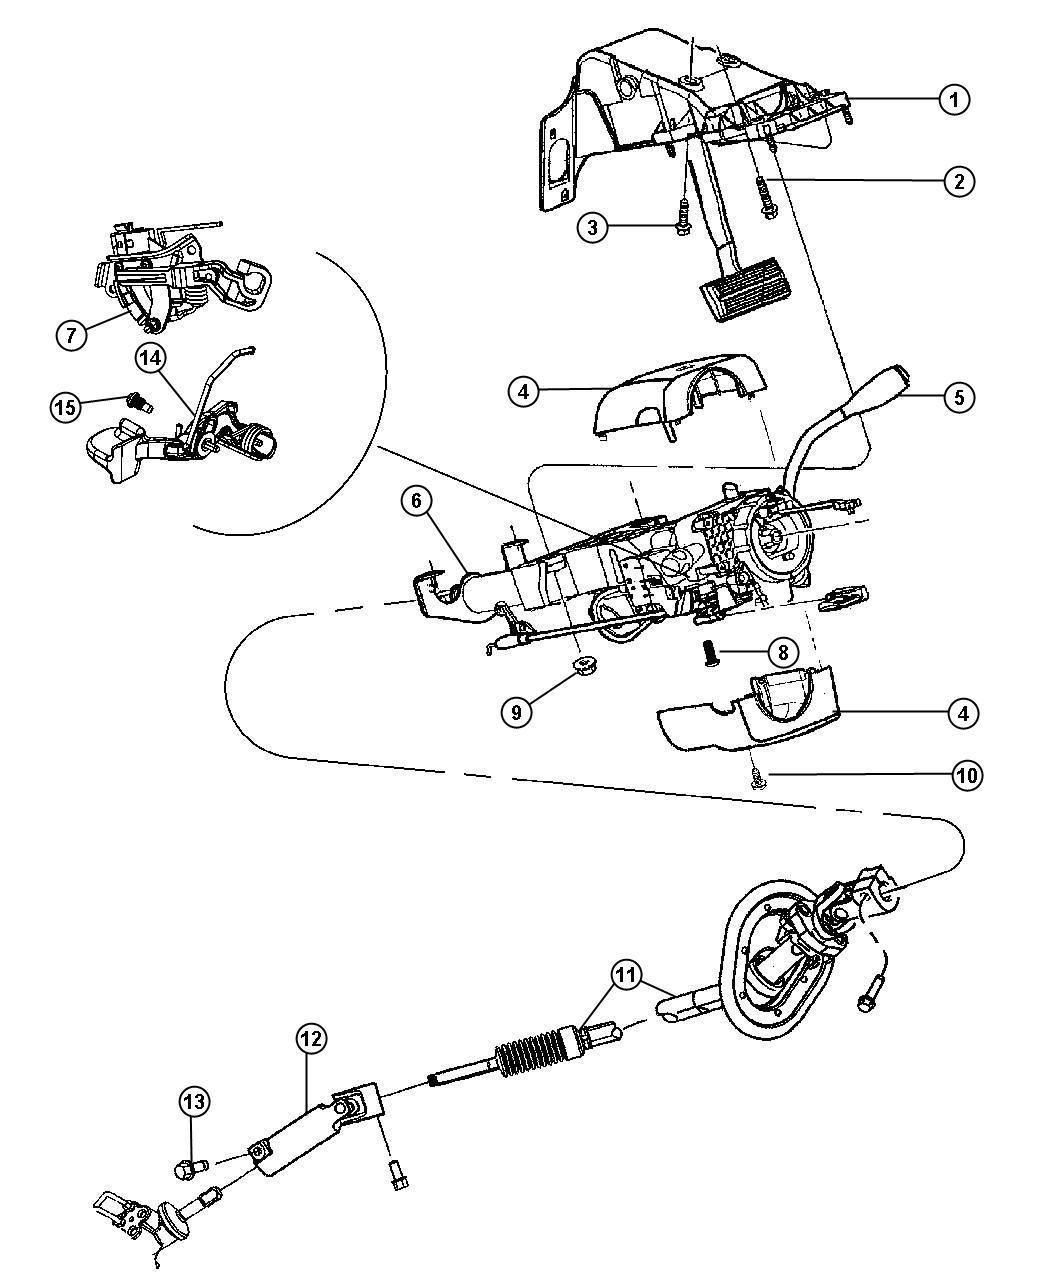 Ram 5500 Shaft. Intermediate, steering column intermediate